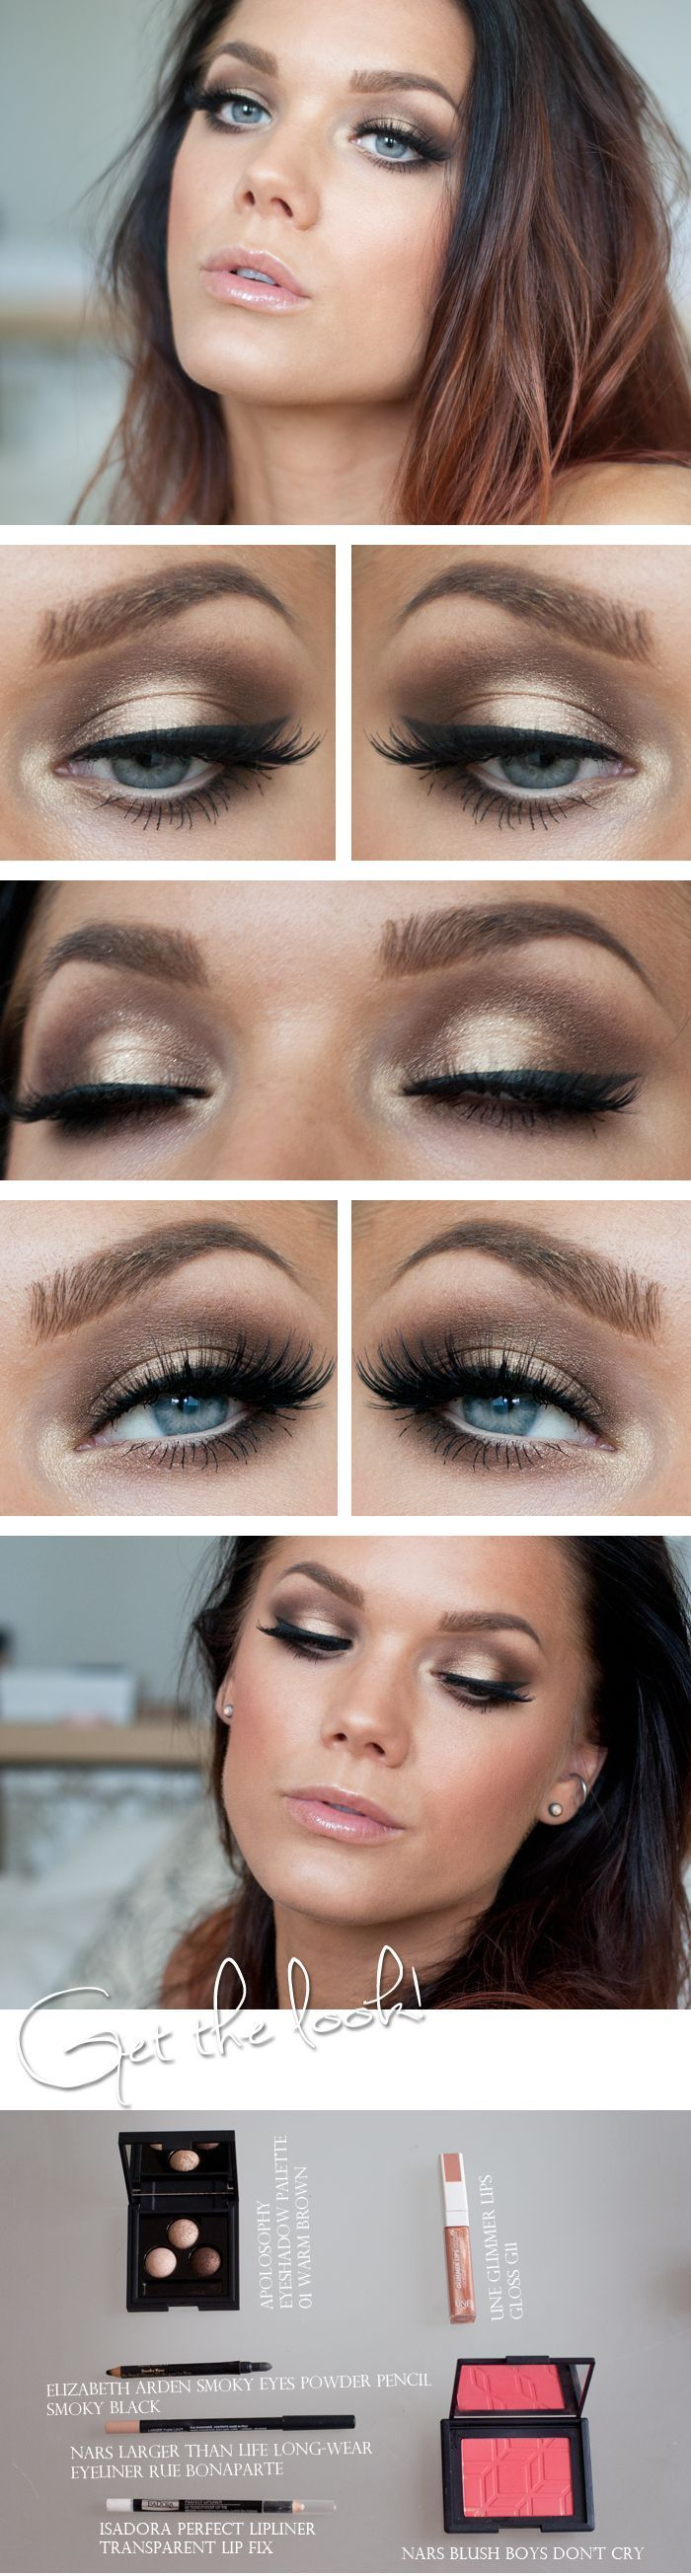 #smoky #gold eyes #makeup, very elegant!